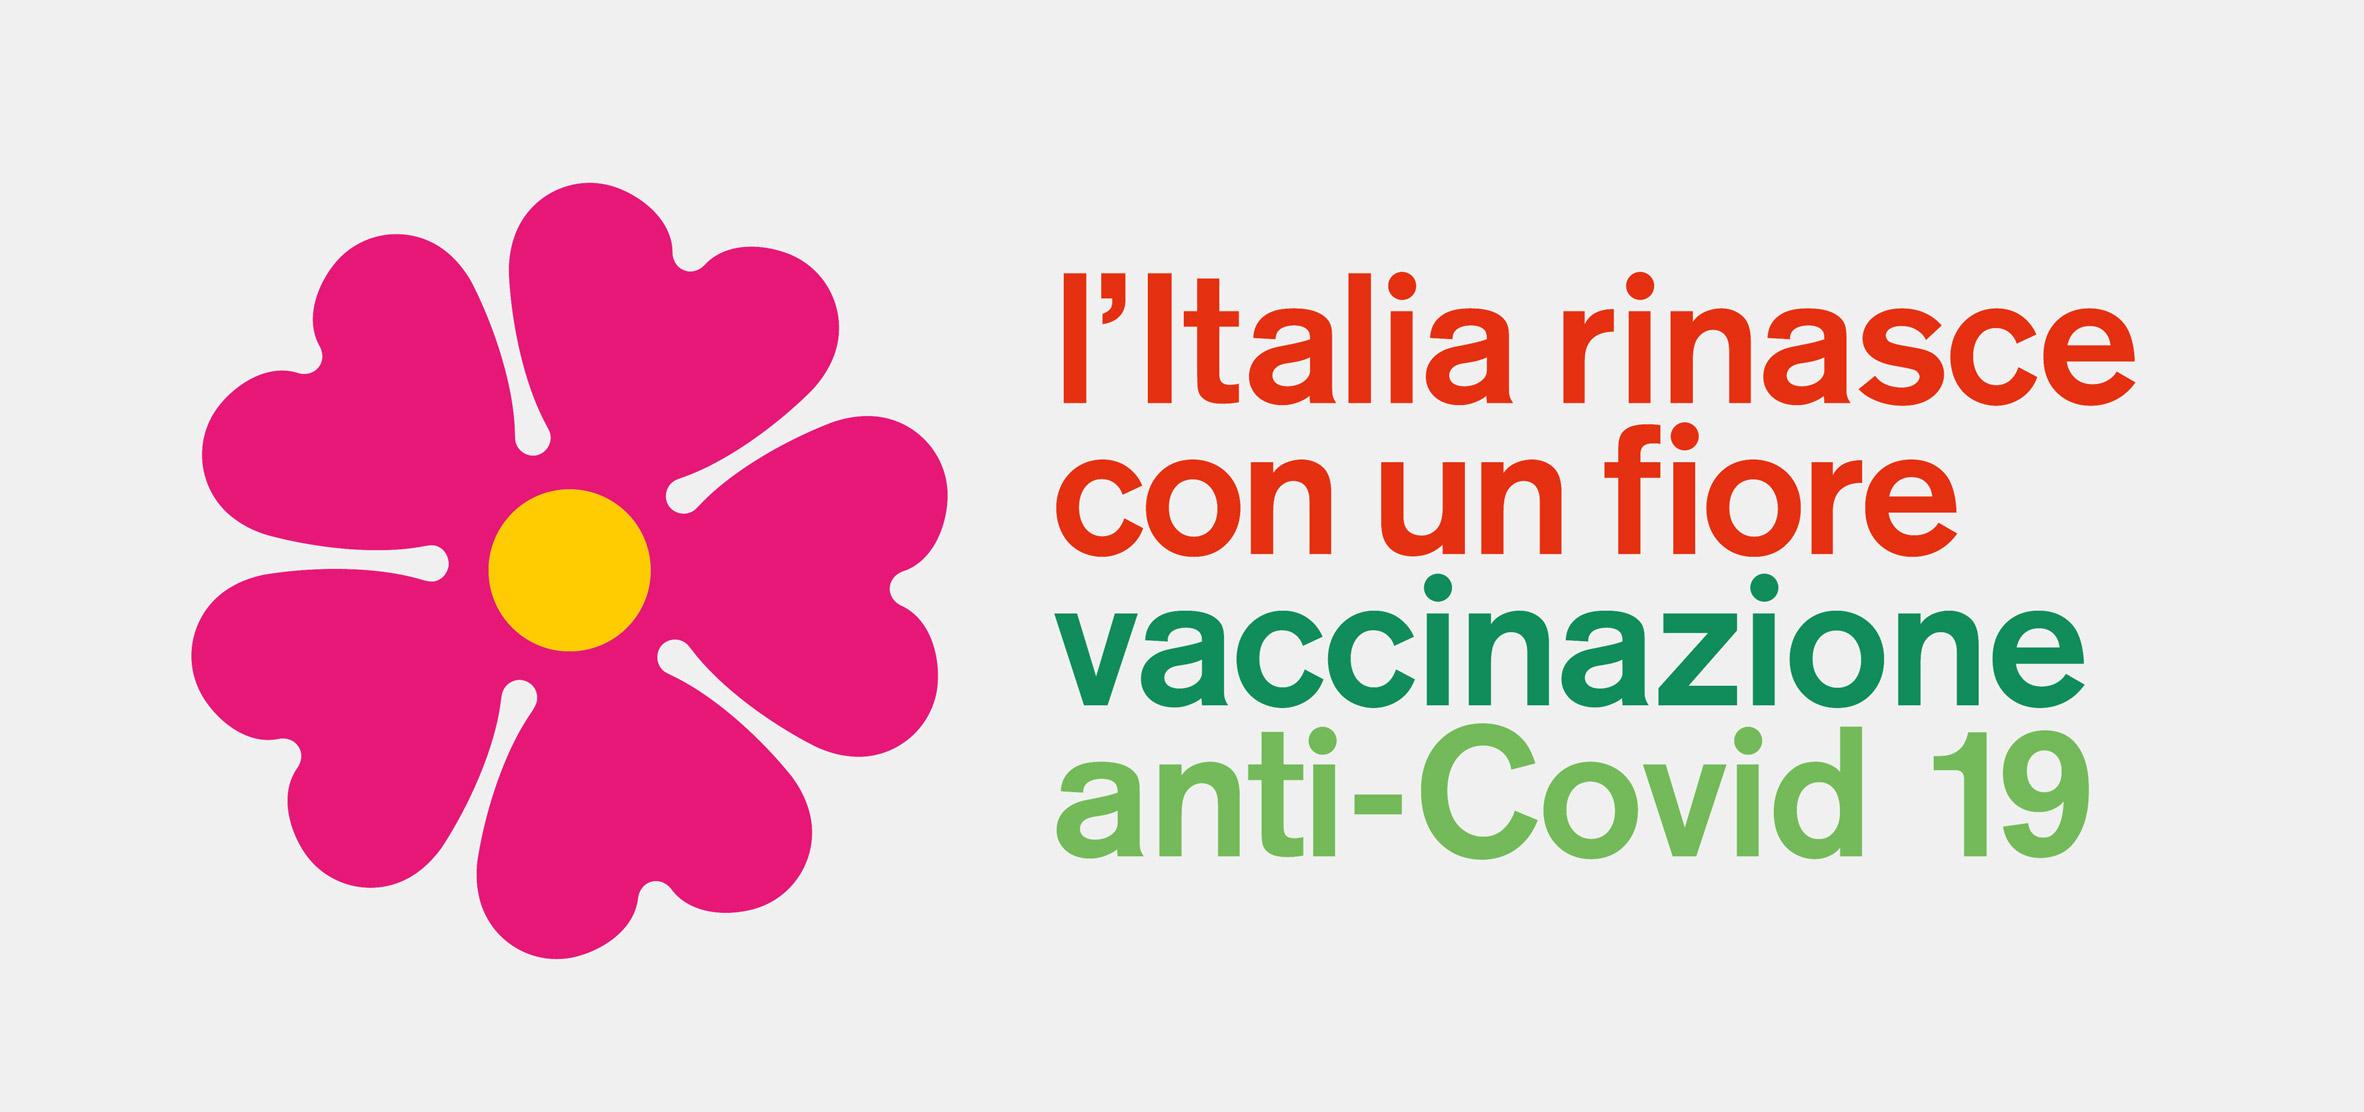 Stefano Boeri coronavirus vaccine campaign logo